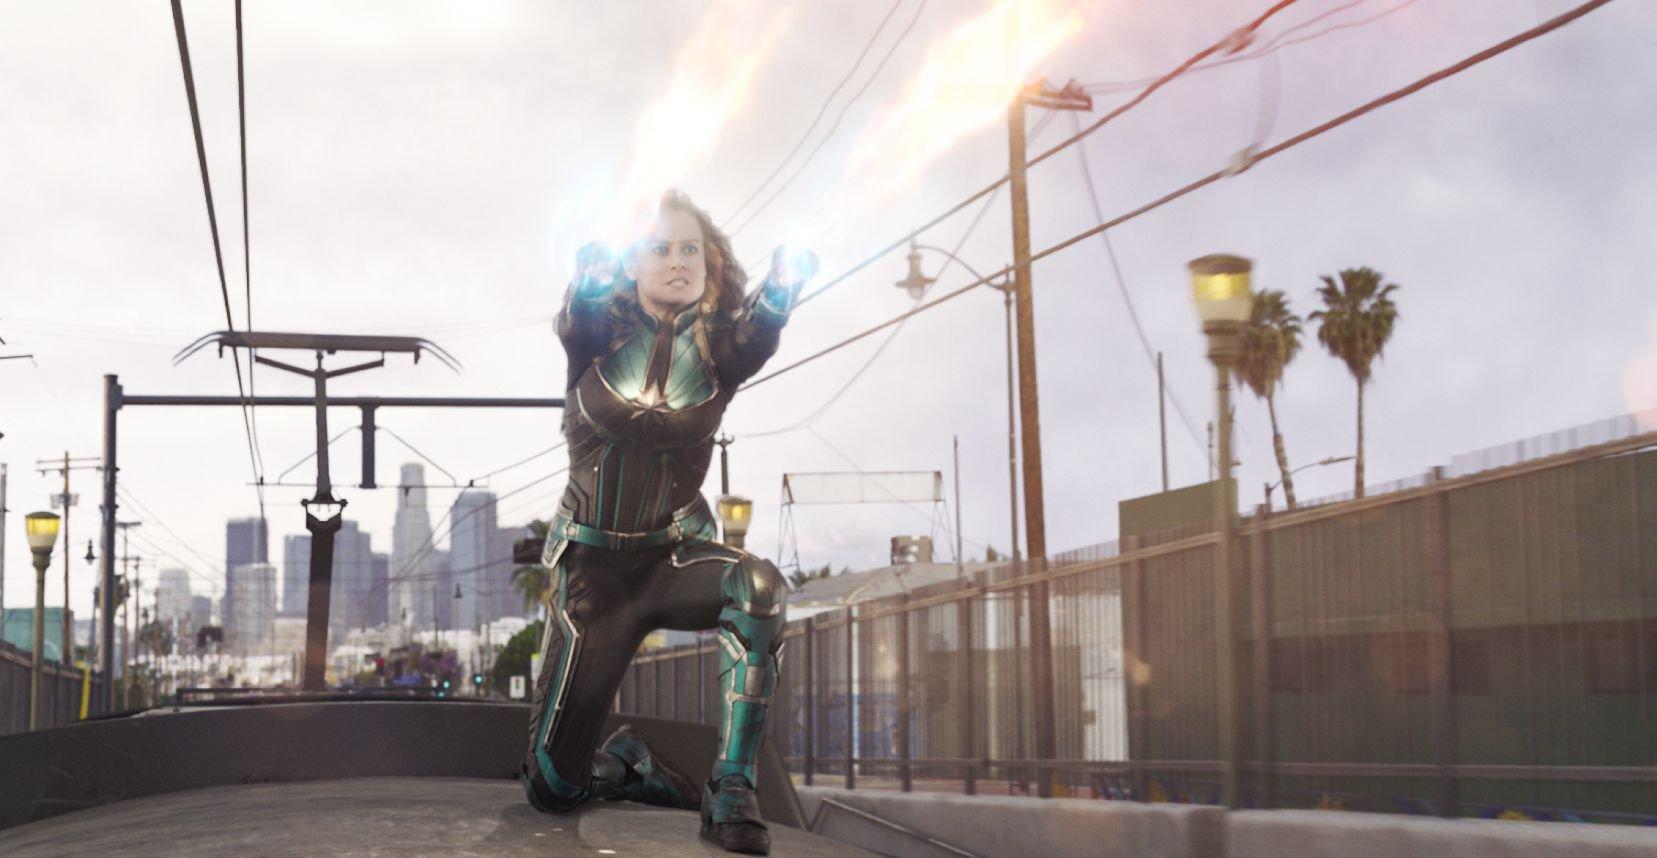 Mandatory Credit: Photo by Film Frame/LILO/SIPA/REX/Shutterstock (10044136i) Brie Larson 'Captain Marvel' film stills, Los Angeles, USA - 19 Sep 2018